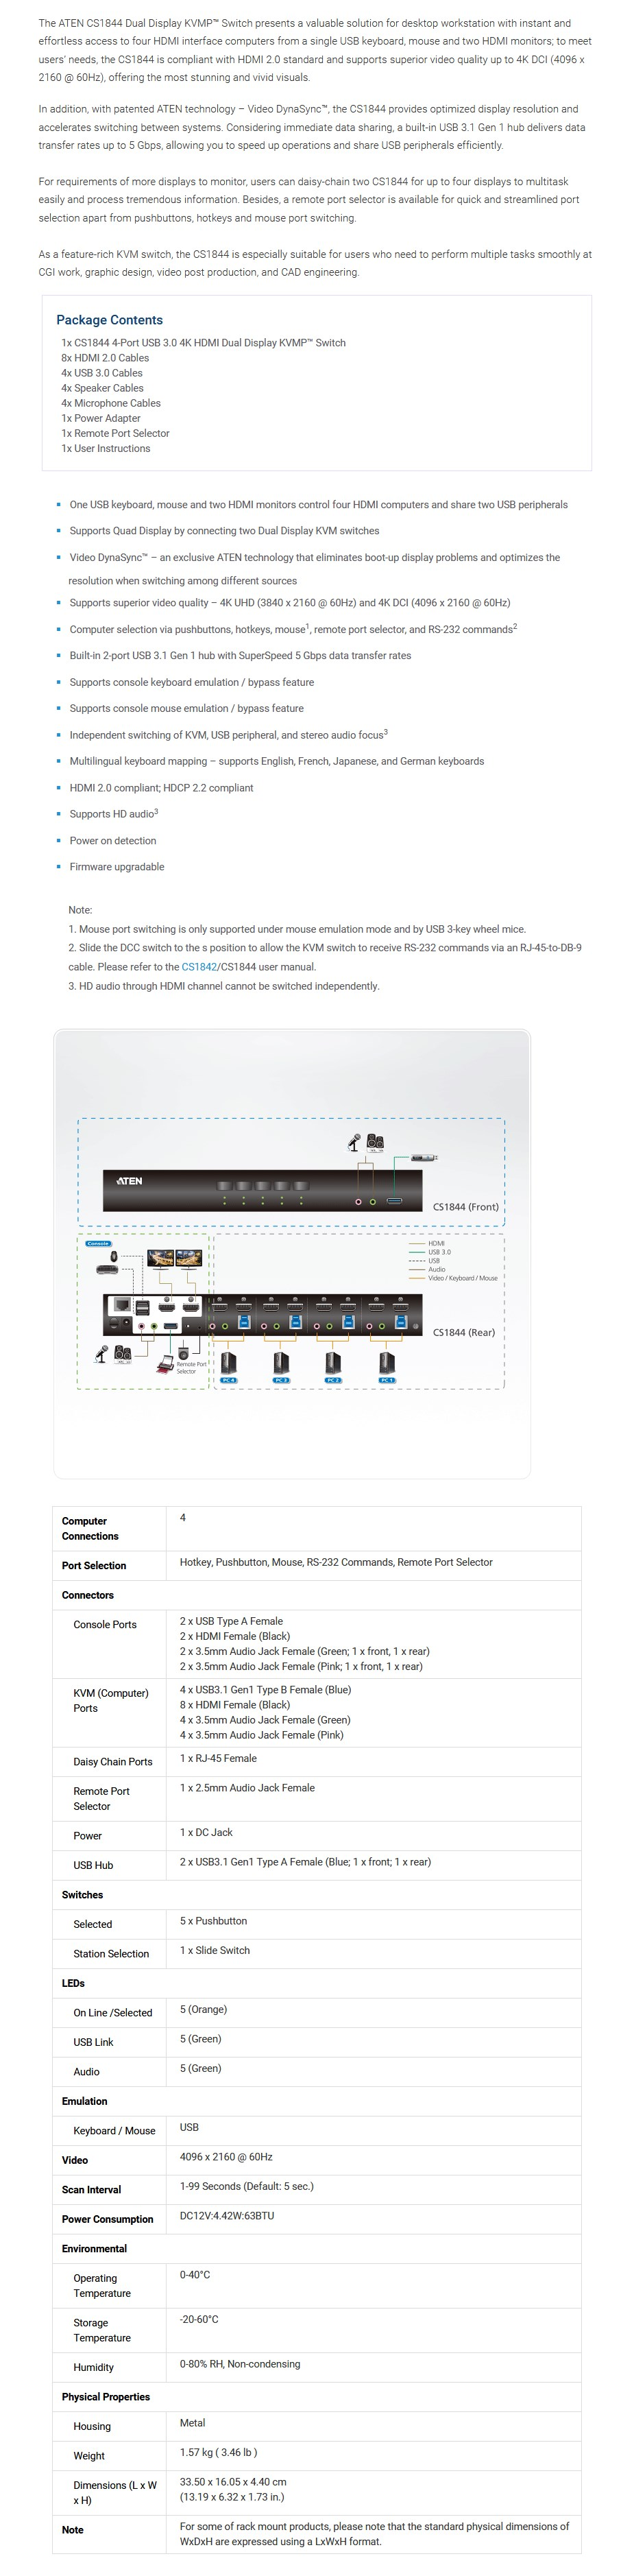 Aten CS1844 4-Port USB3.0 4K HDMI Dual Display KVMP Switch - Overview 1